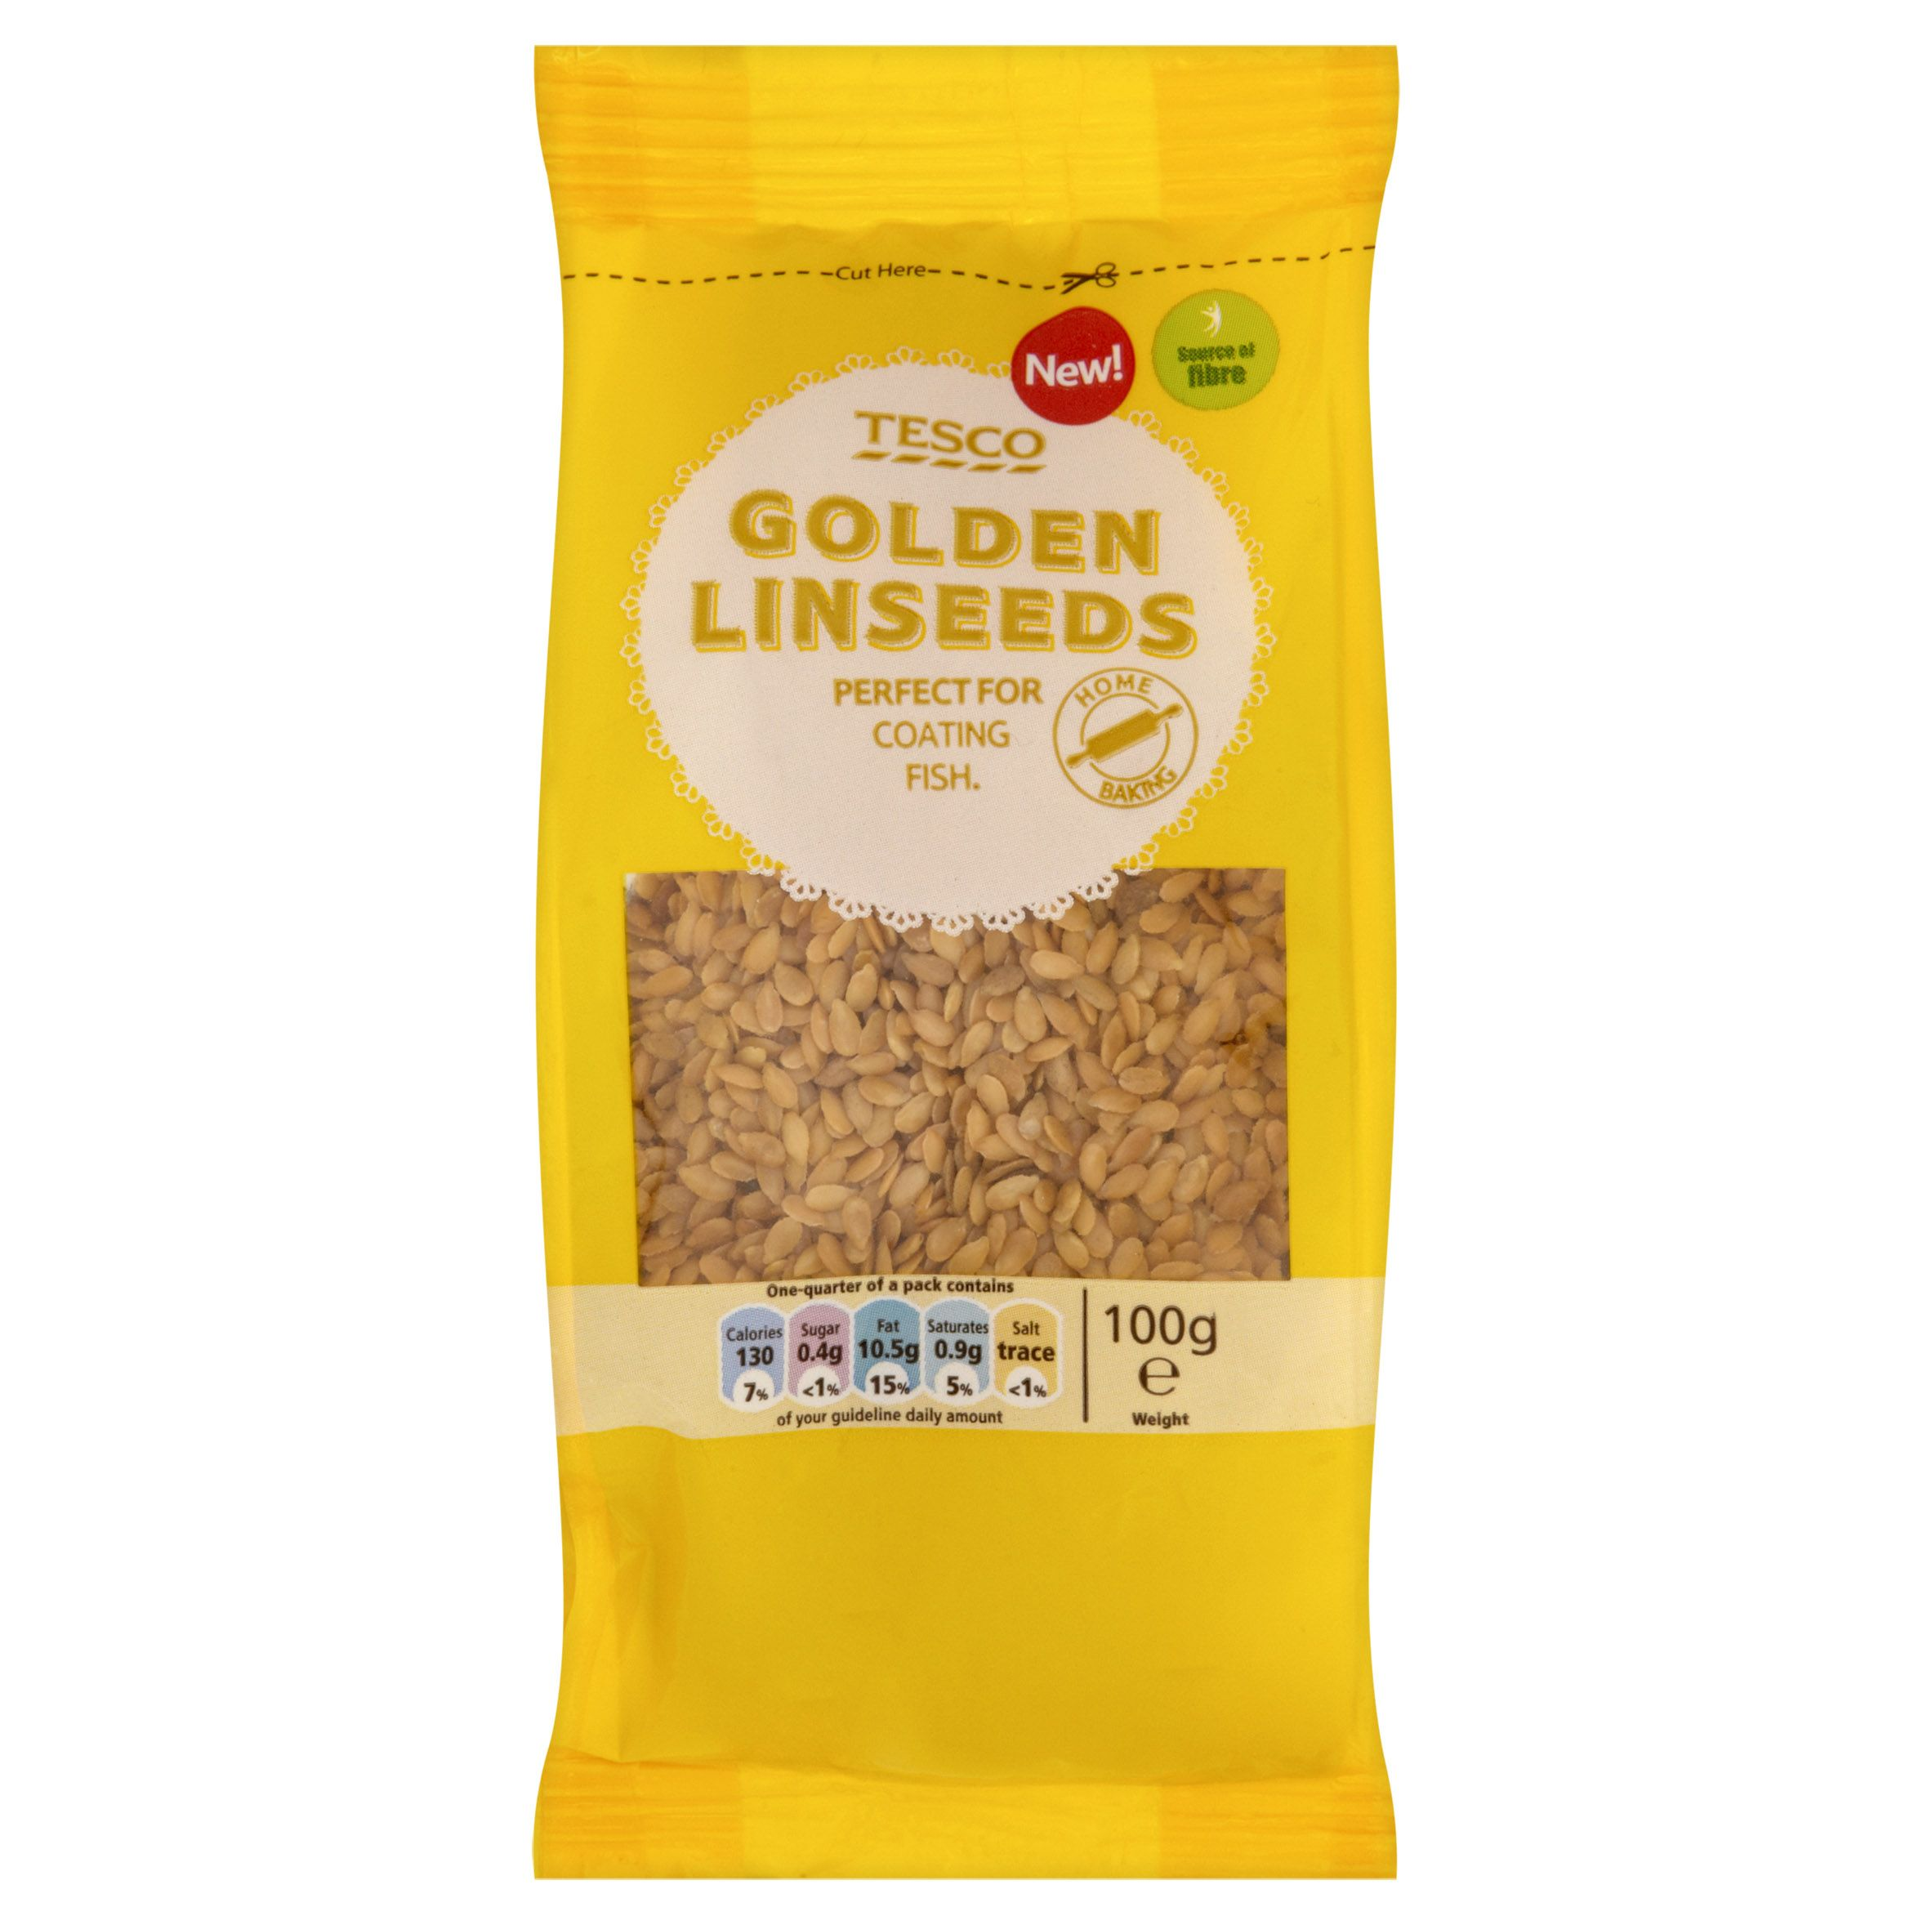 Tesco Golden Linseeds Golden Linseed Tesco Grocery